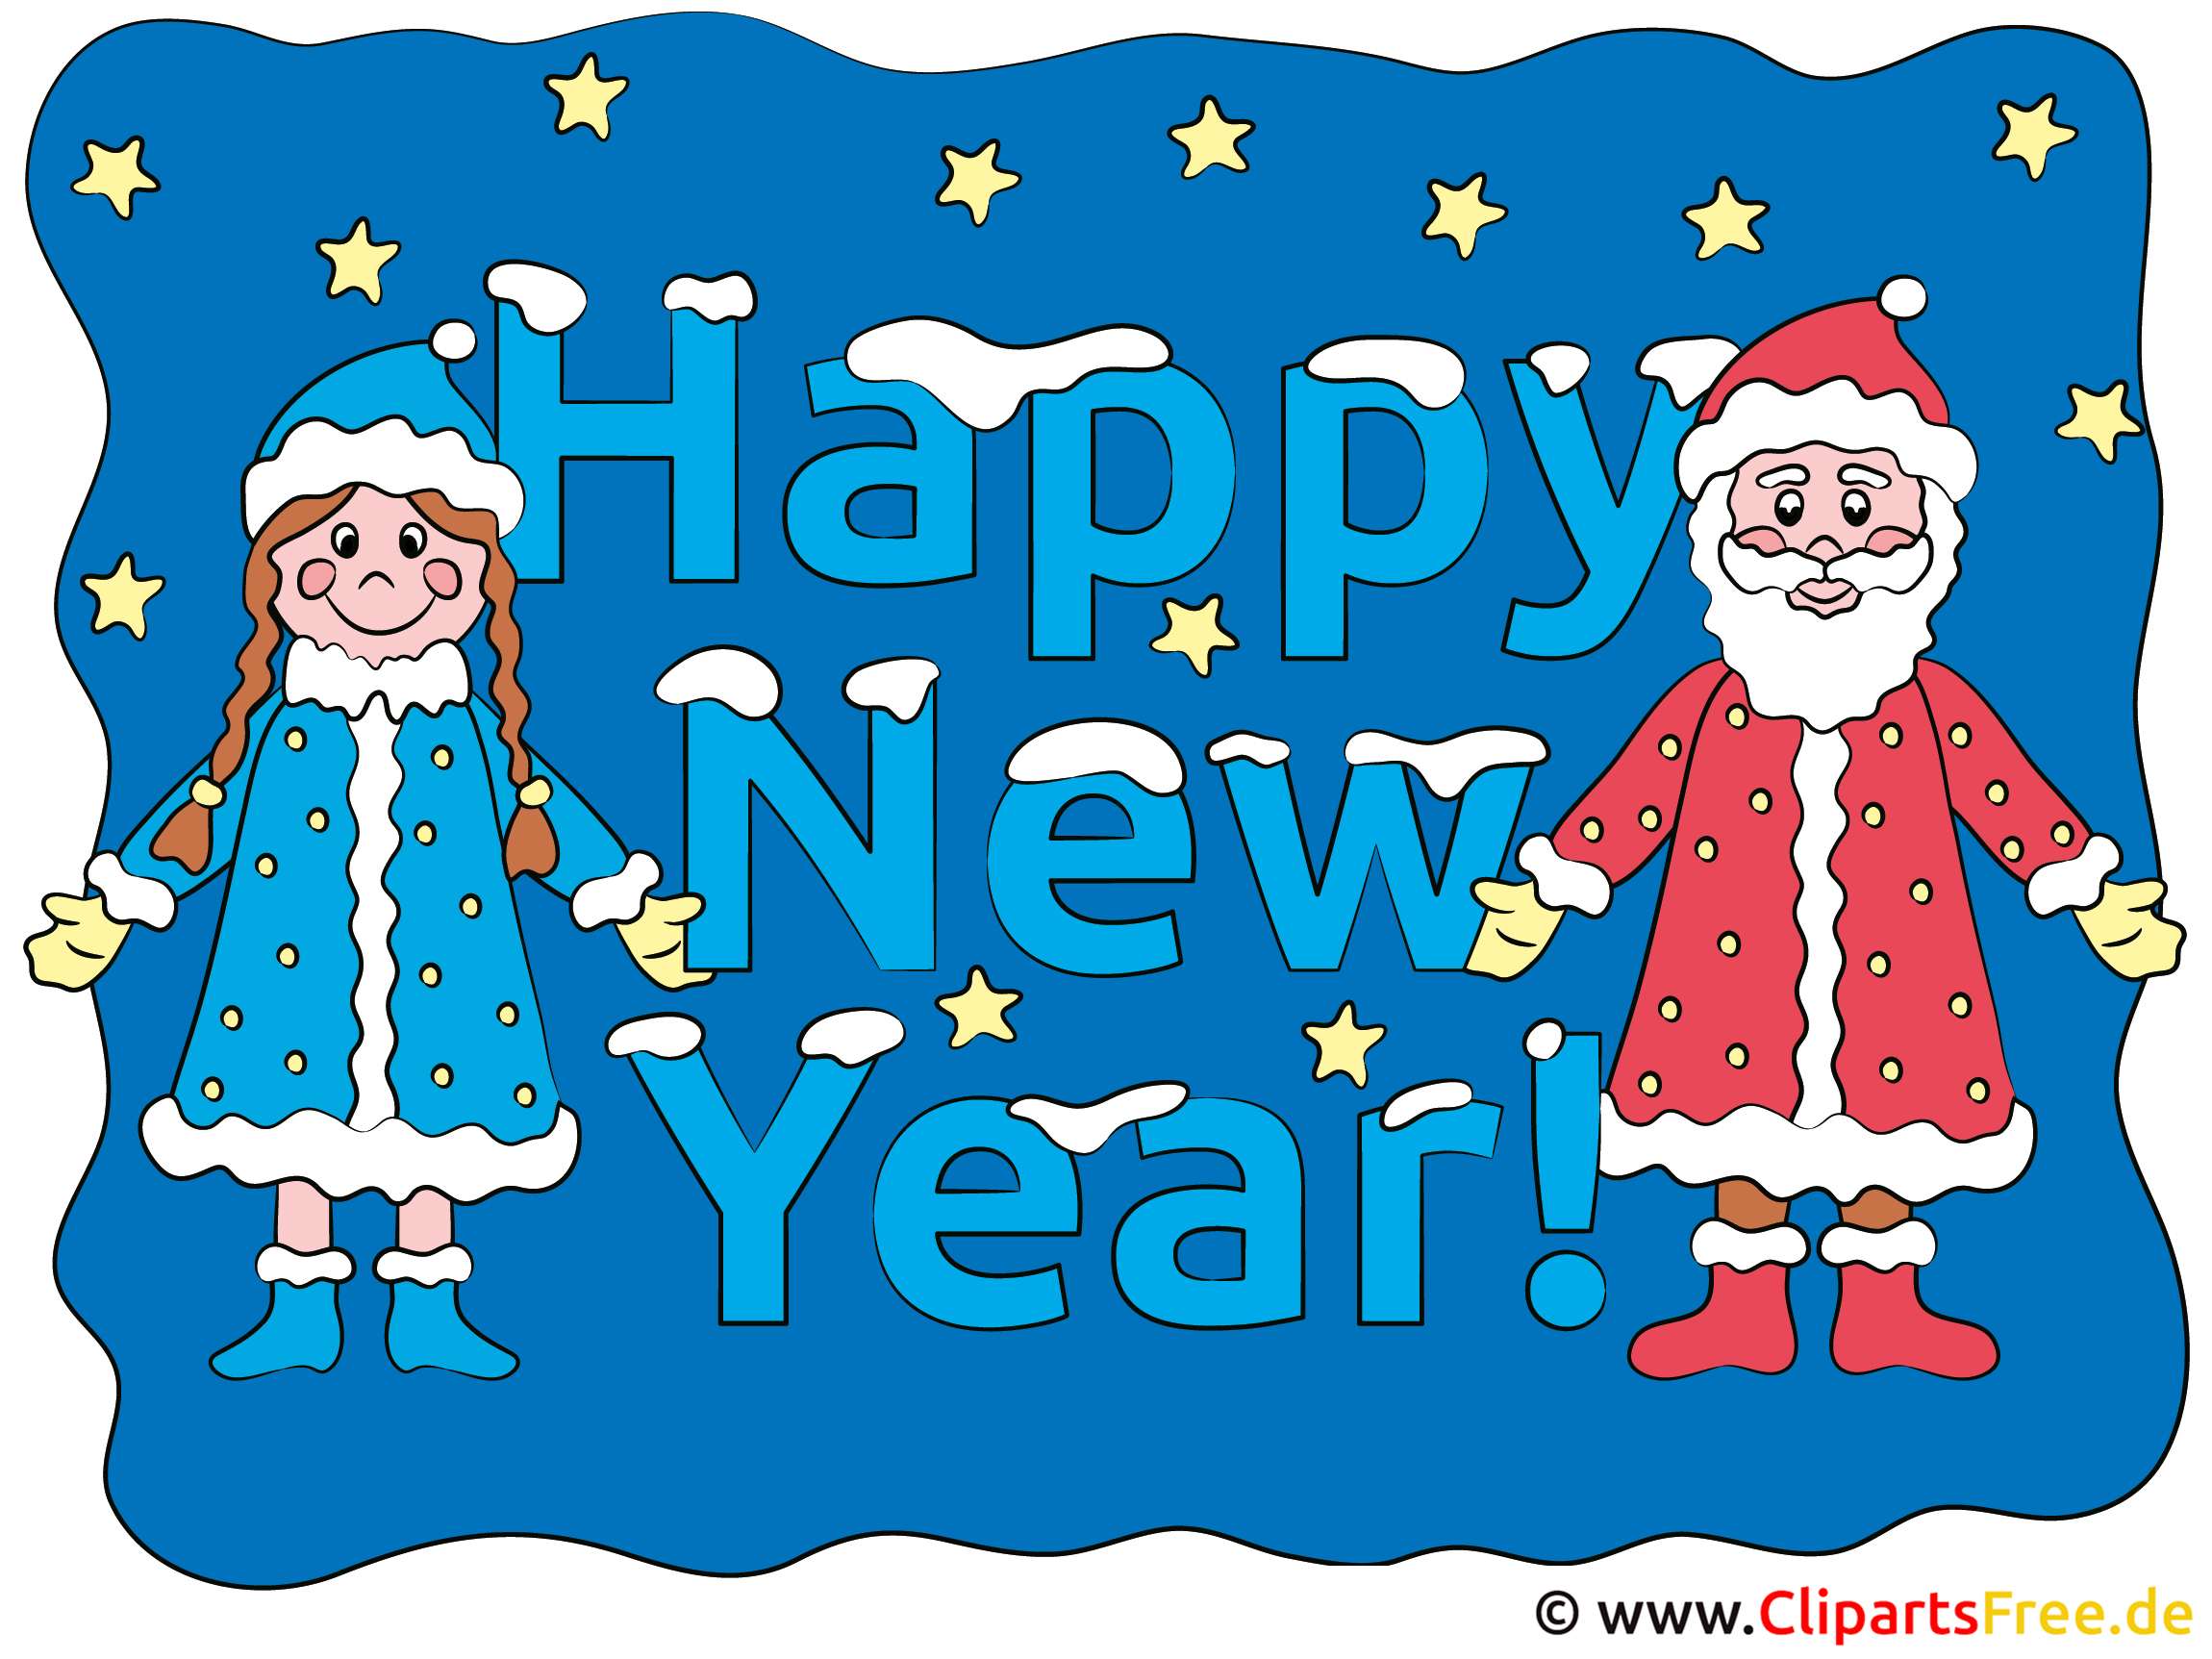 ecard New Year